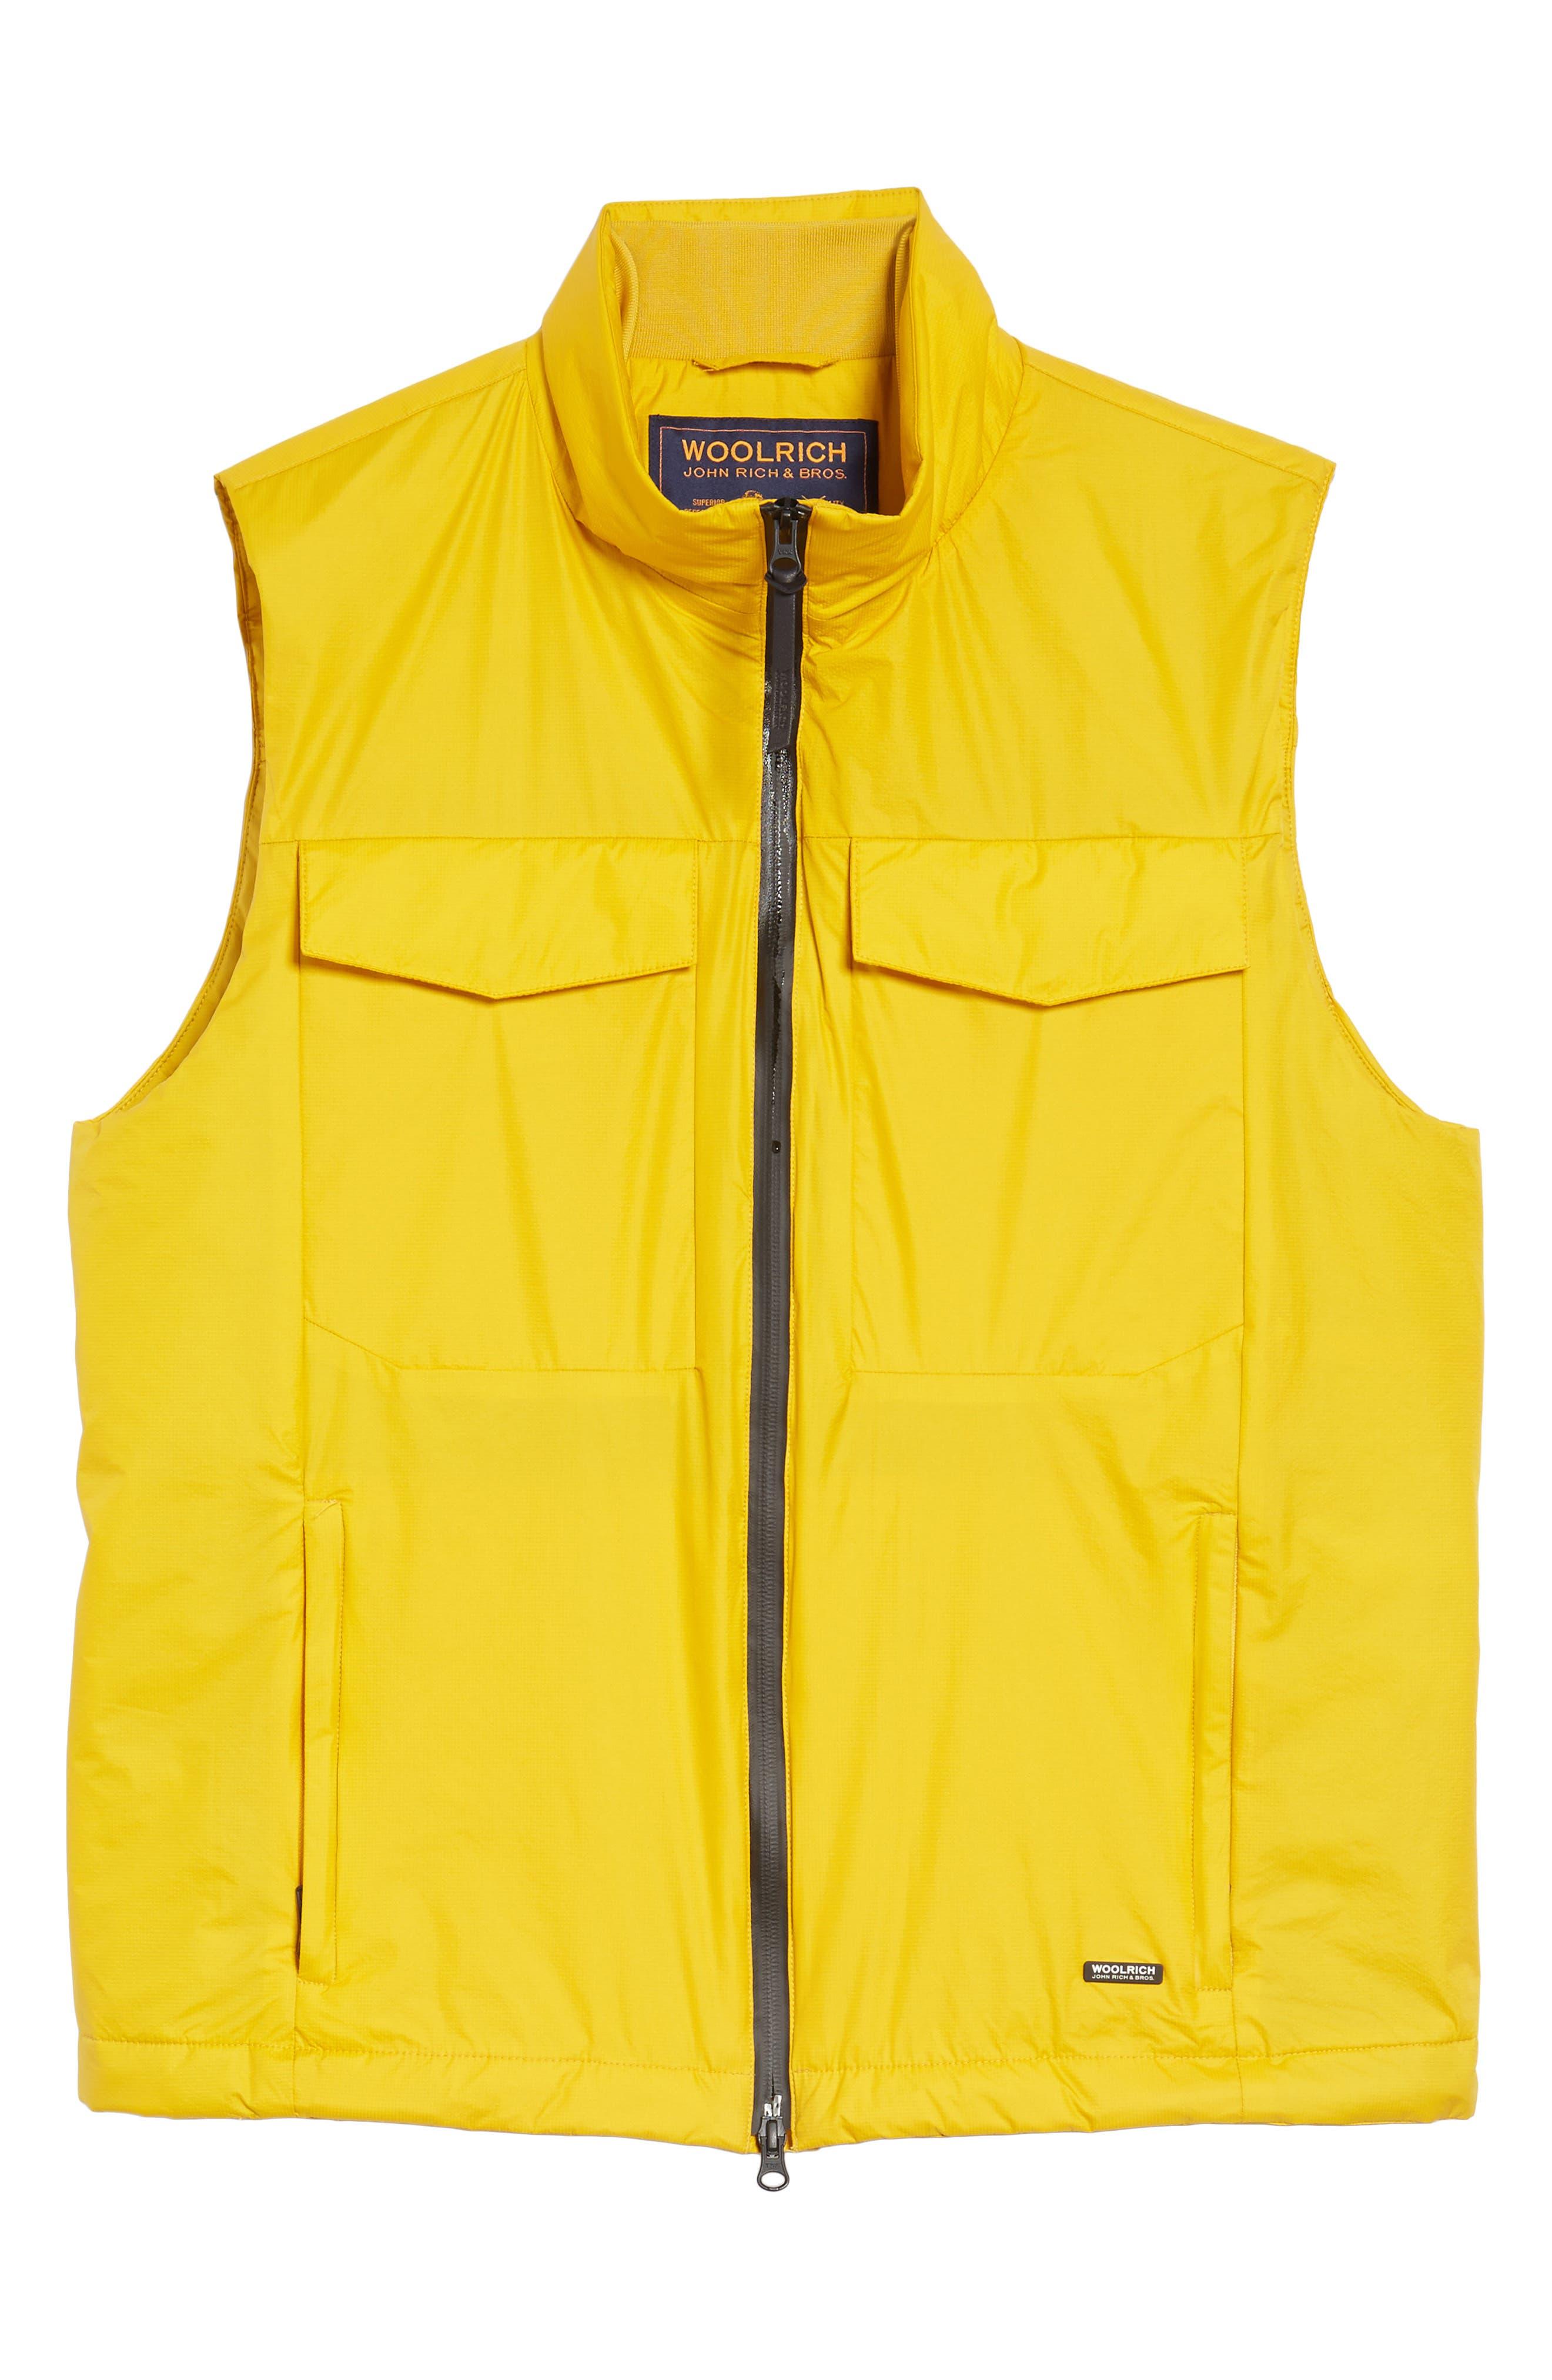 & Bros. Bering Vest,                             Alternate thumbnail 5, color,                             700